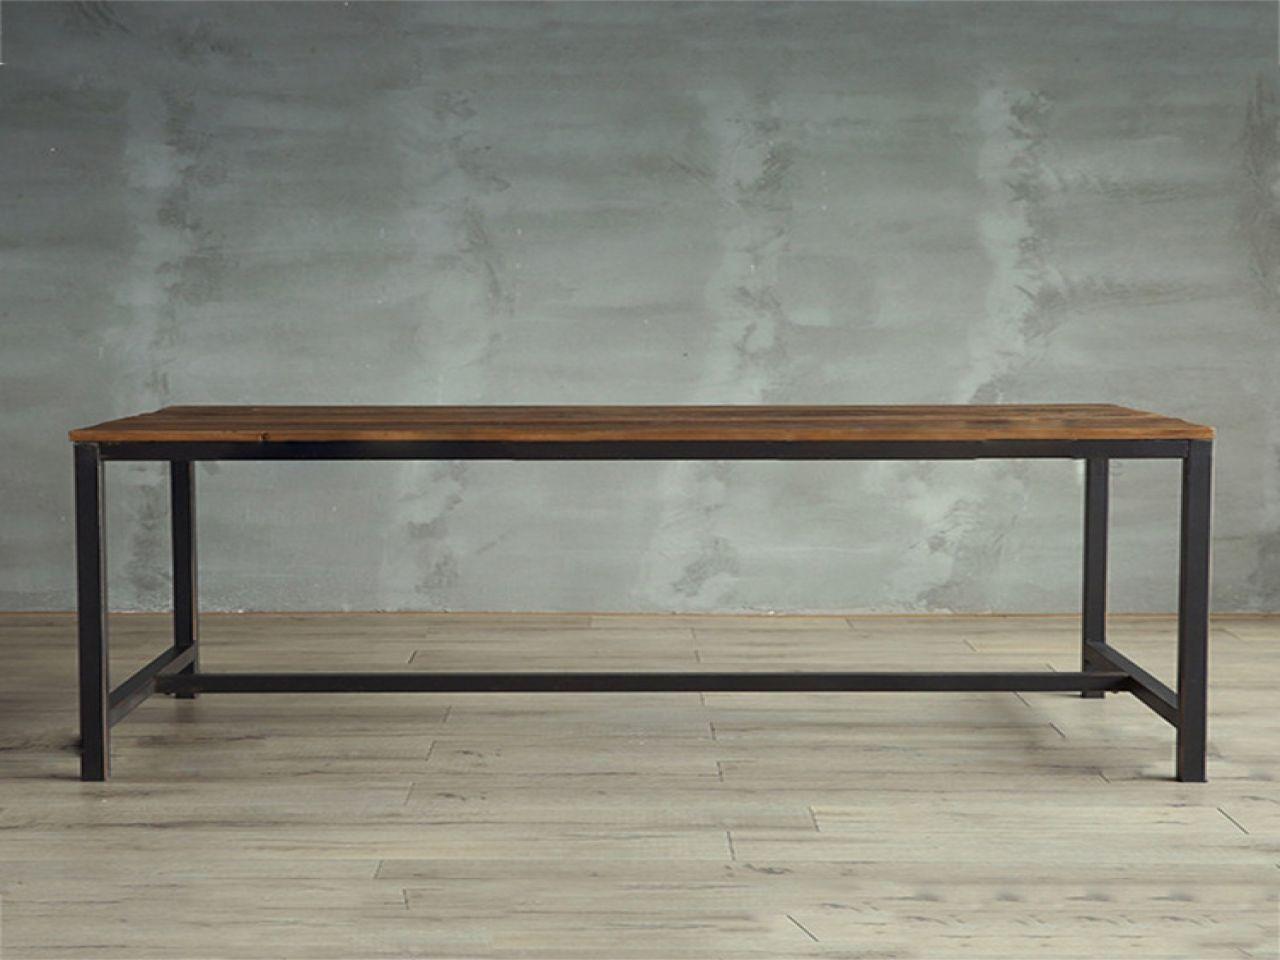 Iron and wood furniture - Iron Bookcase Wood Shelves Outdoor Wrought Iron Wood Wrought Iron